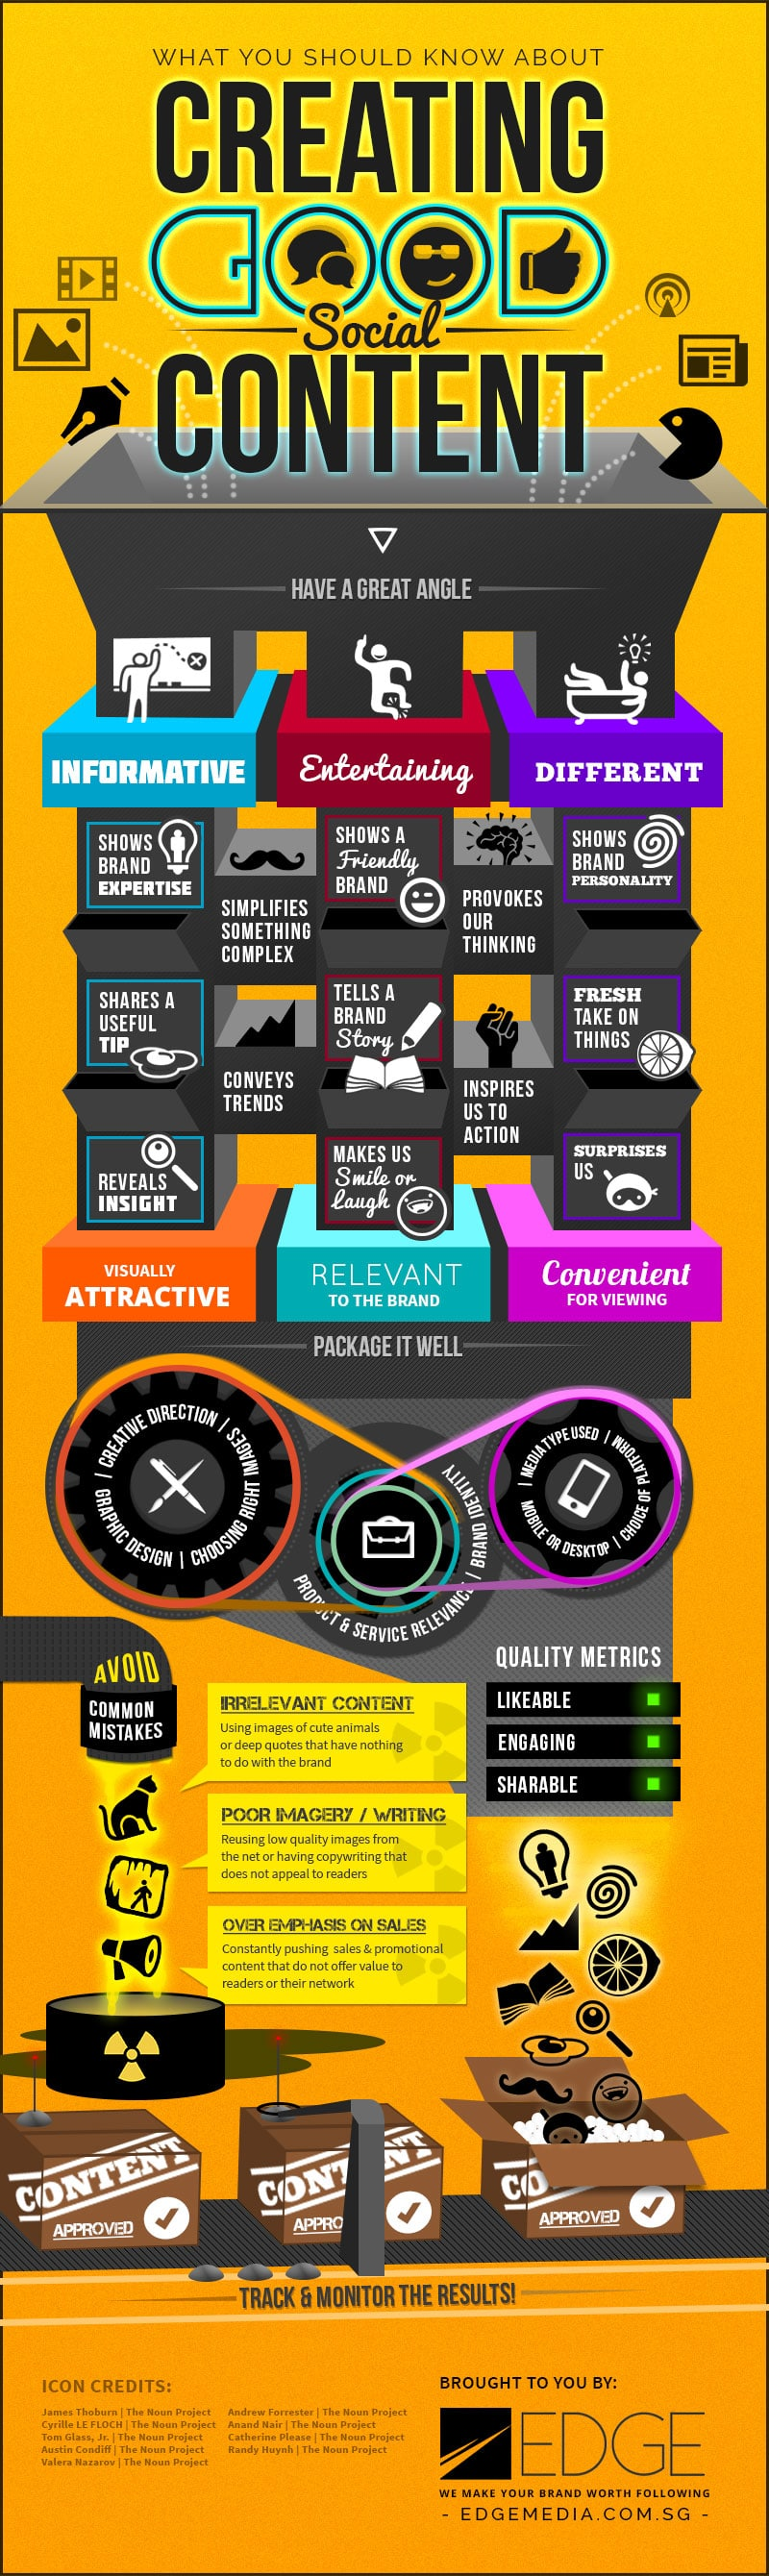 create-good-social-content